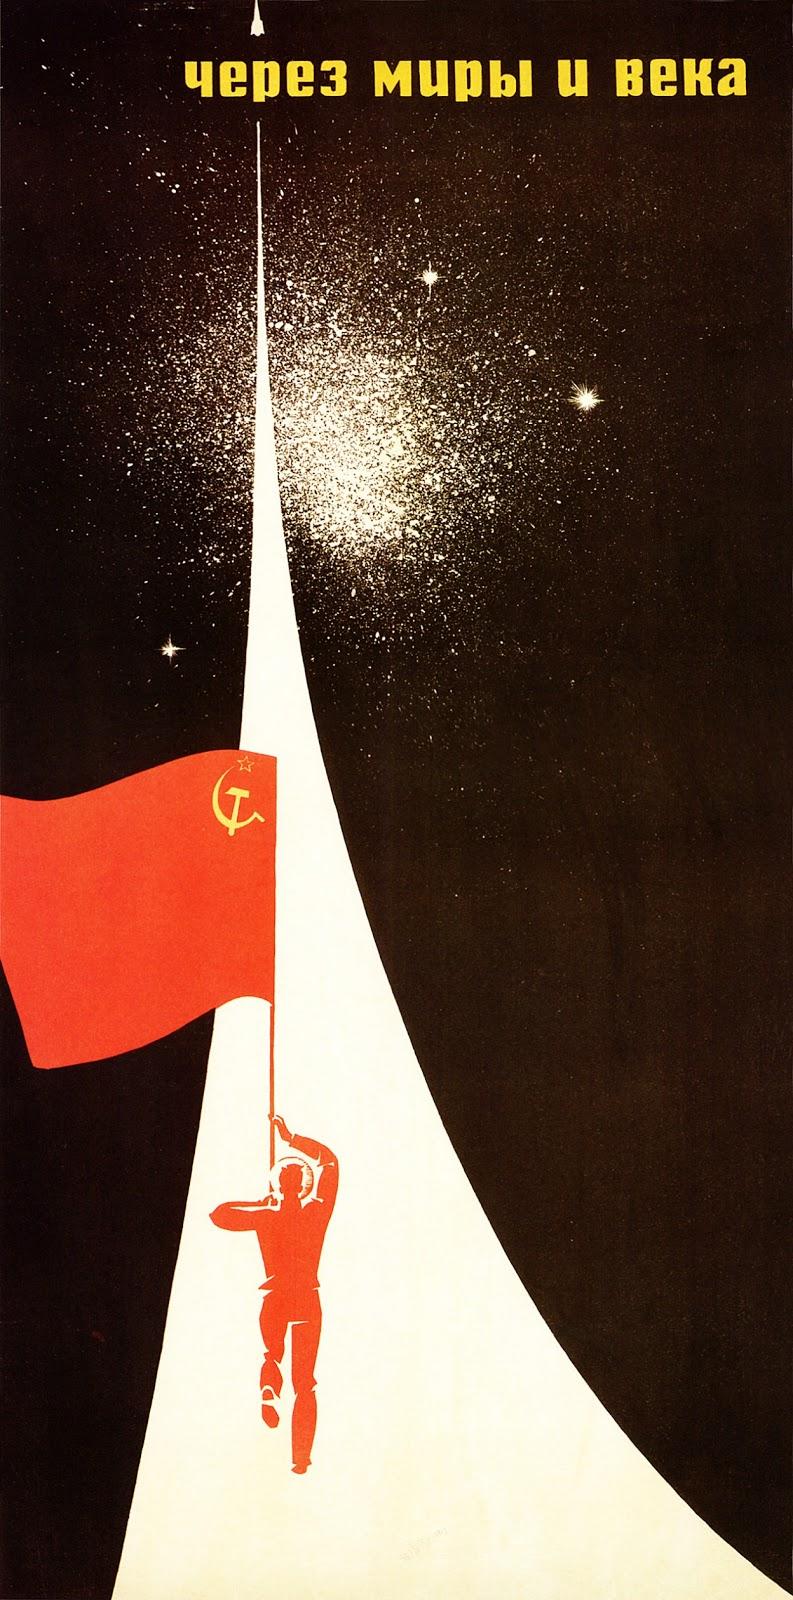 soviet space program name - photo #10